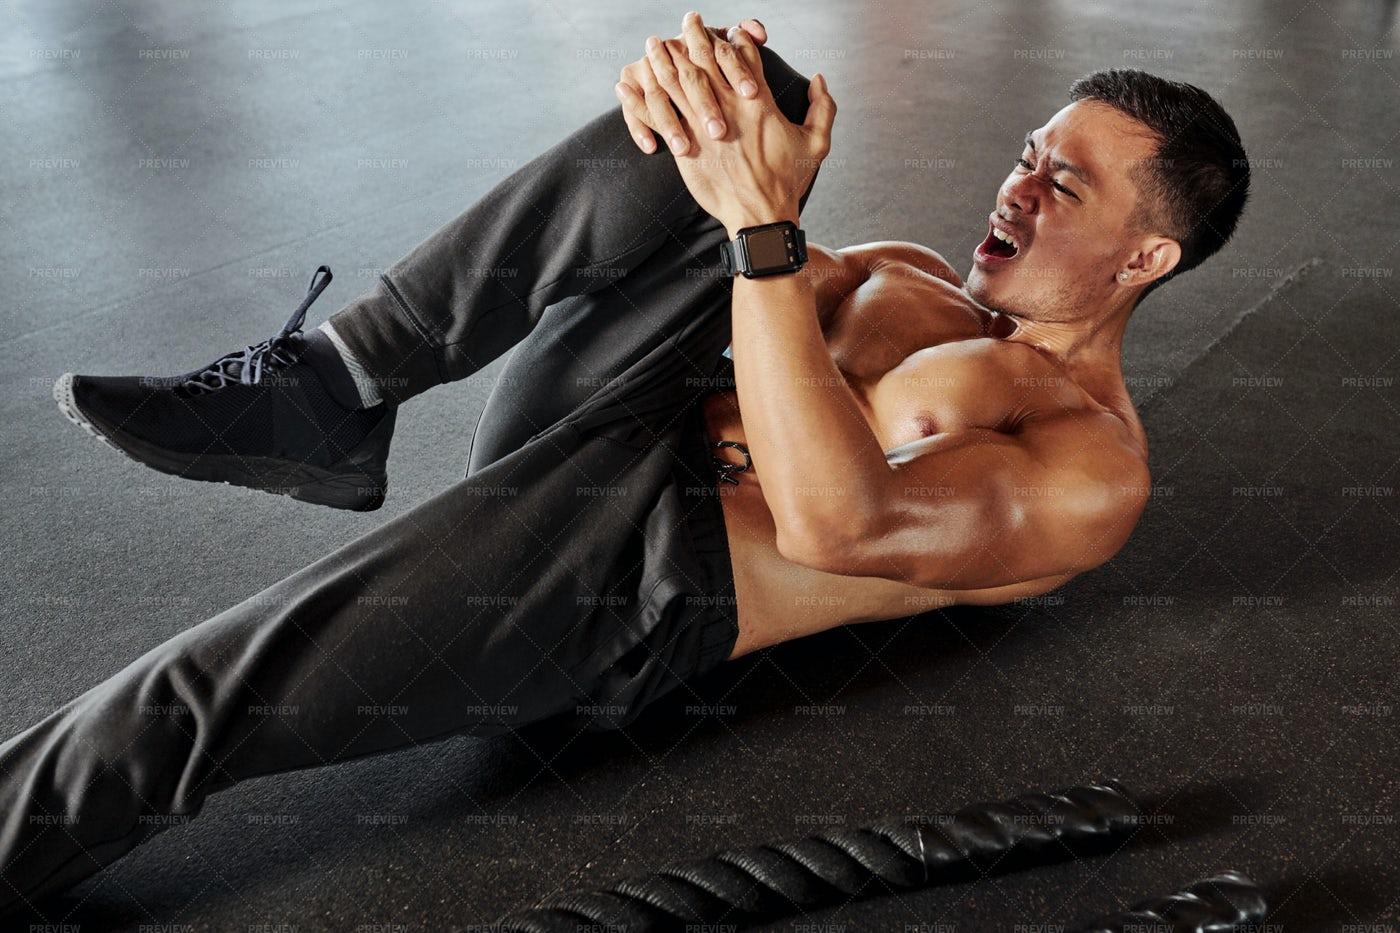 Man Exercising On The Floor: Stock Photos